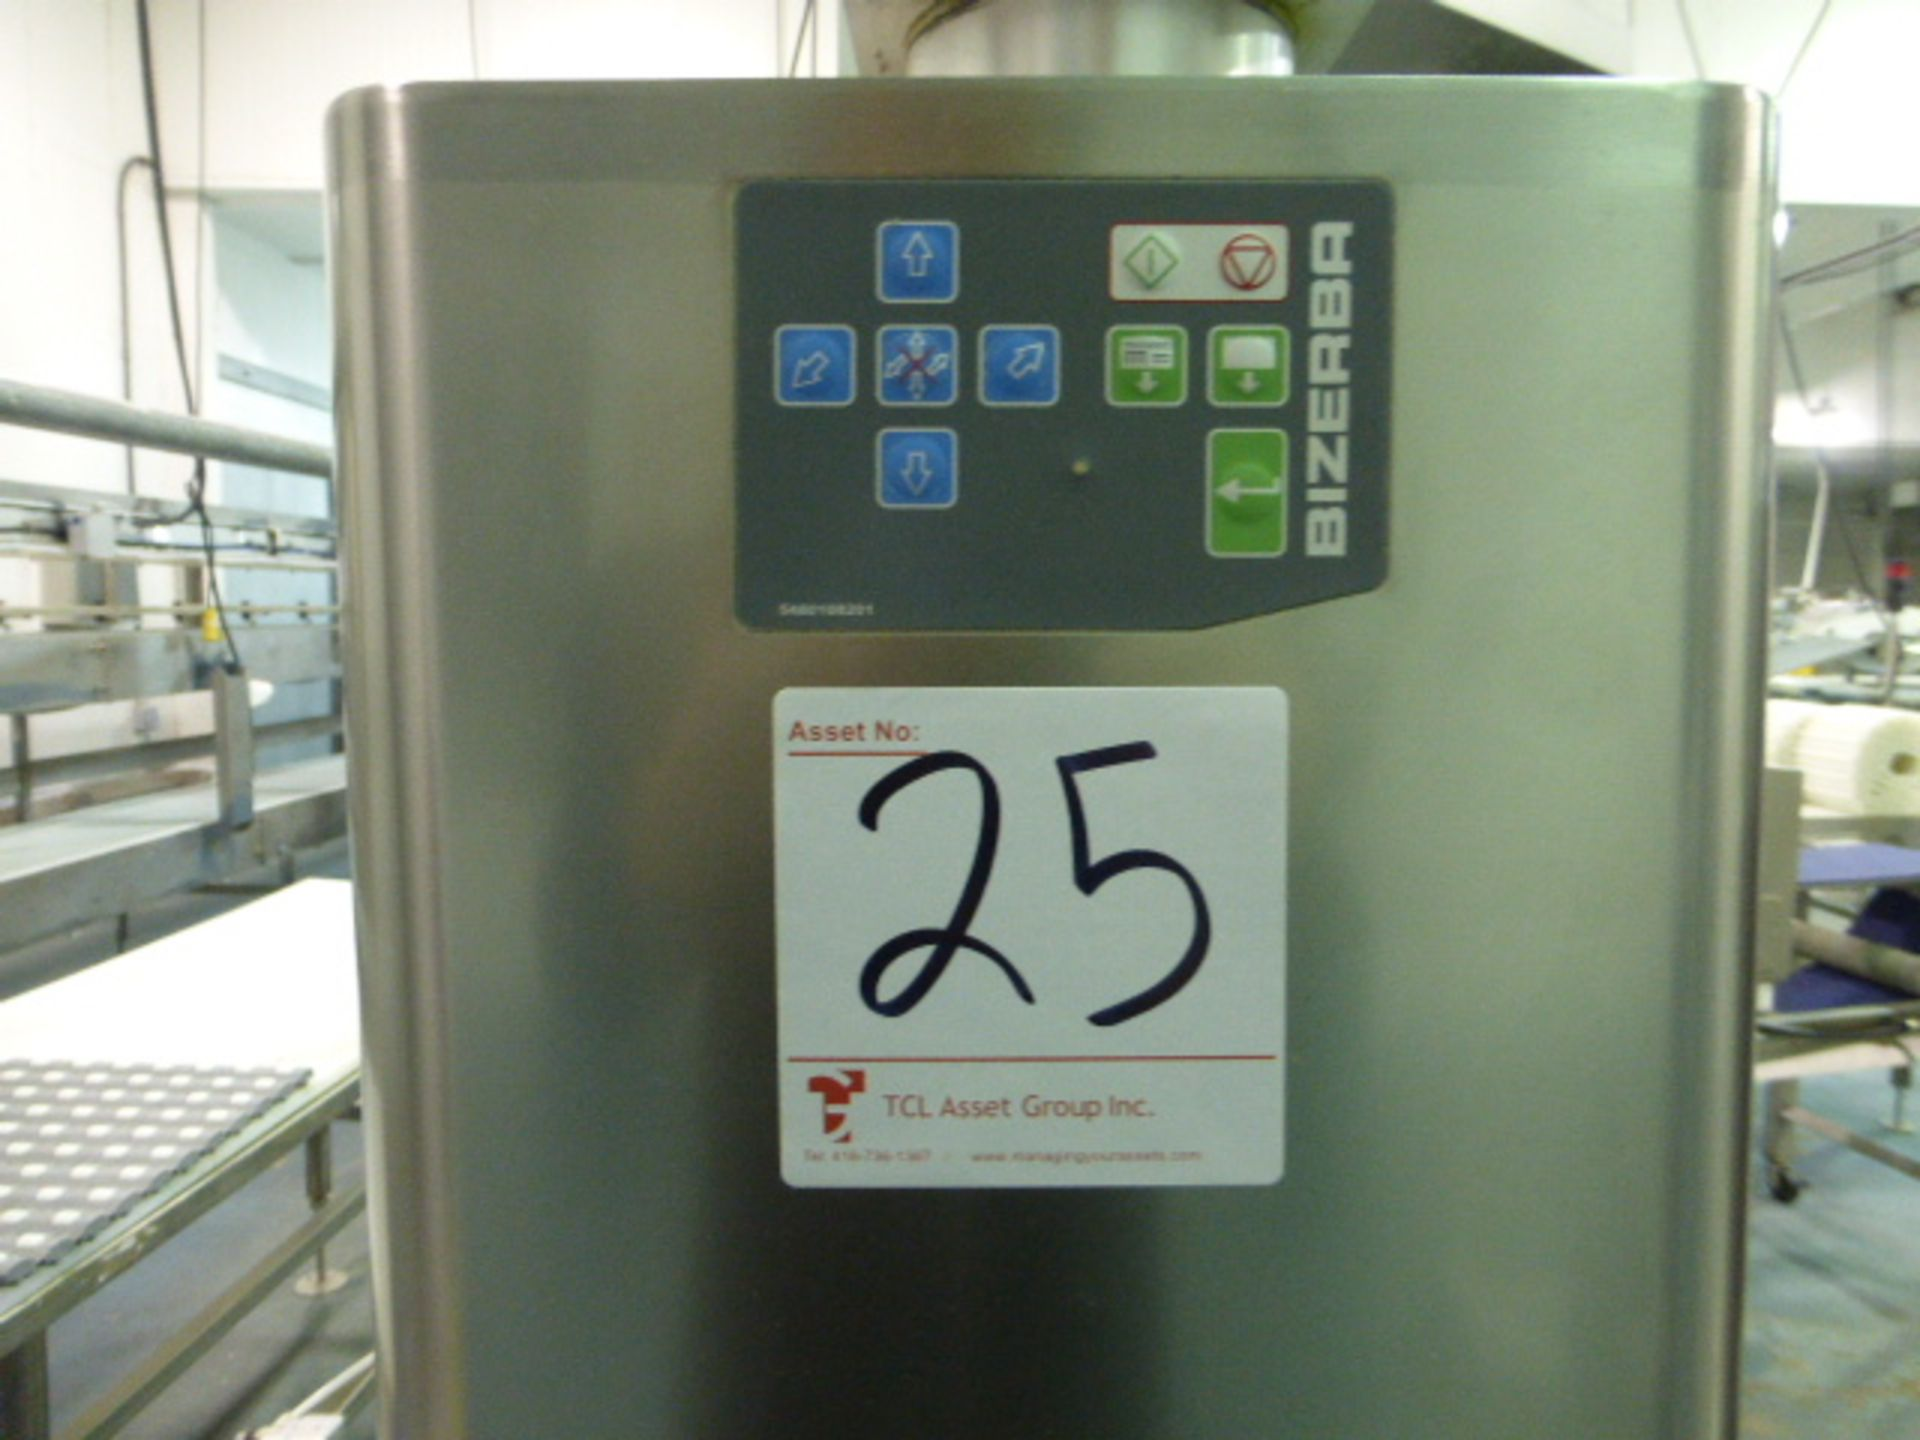 Lot 25 - Bizerba labeler (SLAVE), p/n 5484701002, s/n 10835201 c/w conveyor/stand